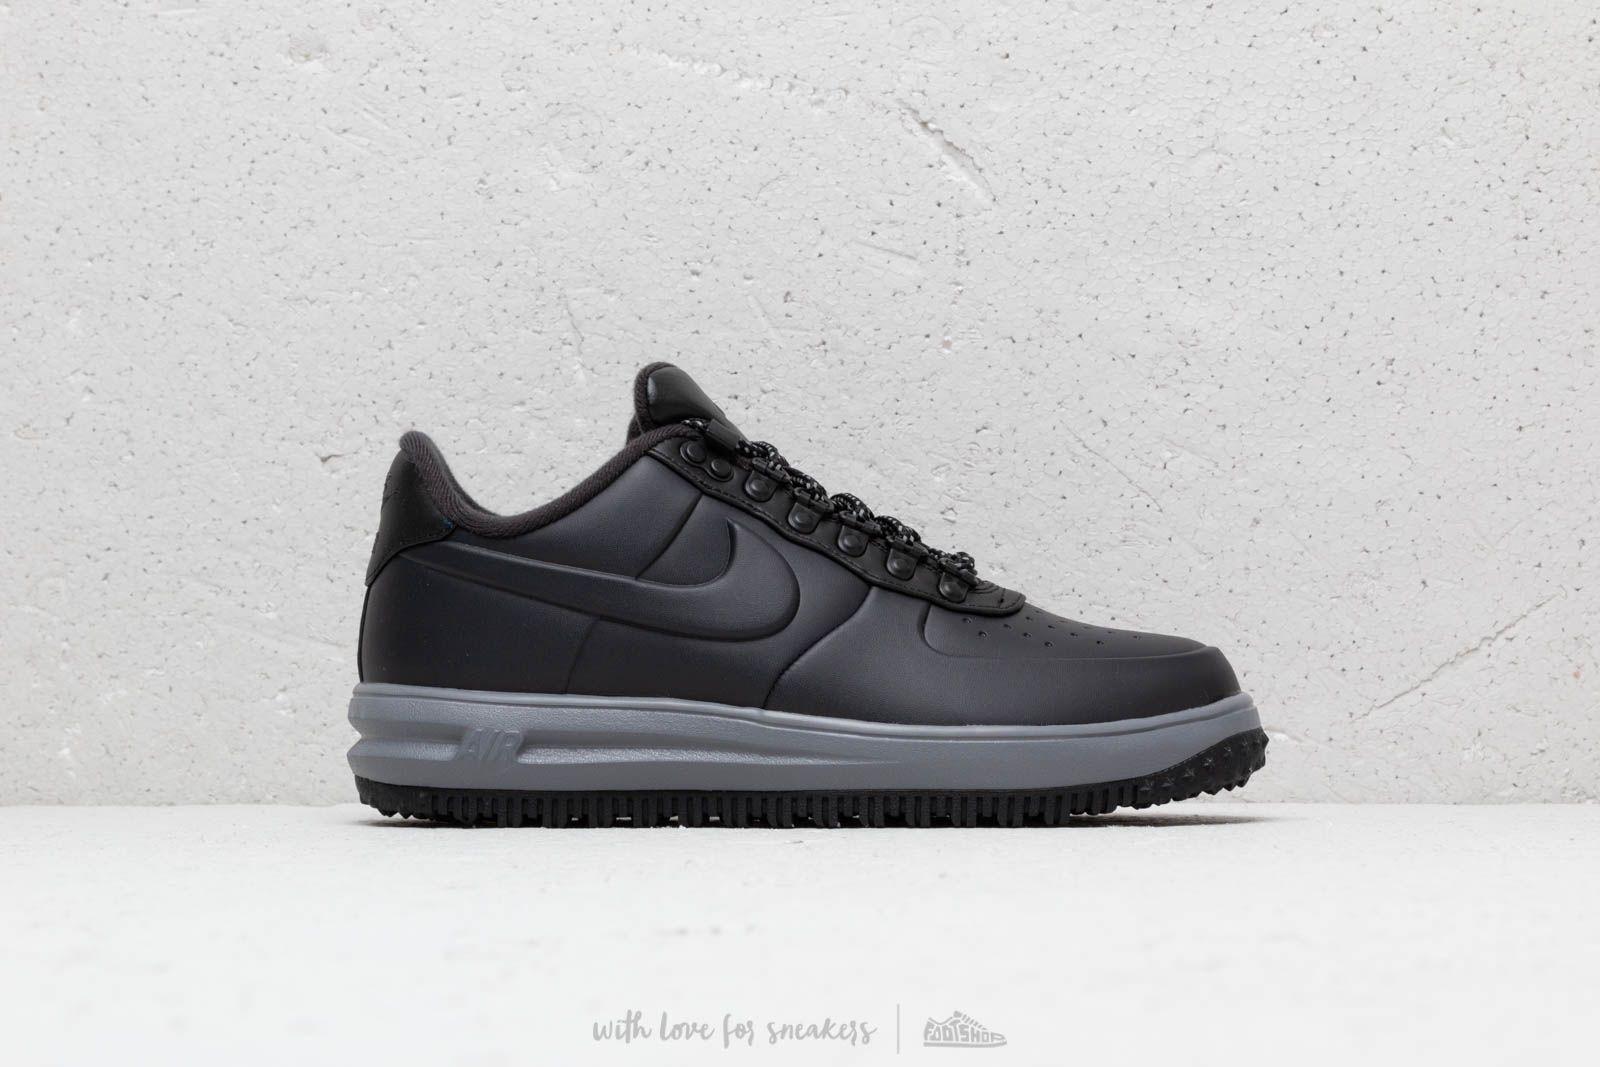 meilleur site web dcc59 c968a Nike LF1 Duckboot Low Oil Grey/ Oil Grey-Black | Footshop